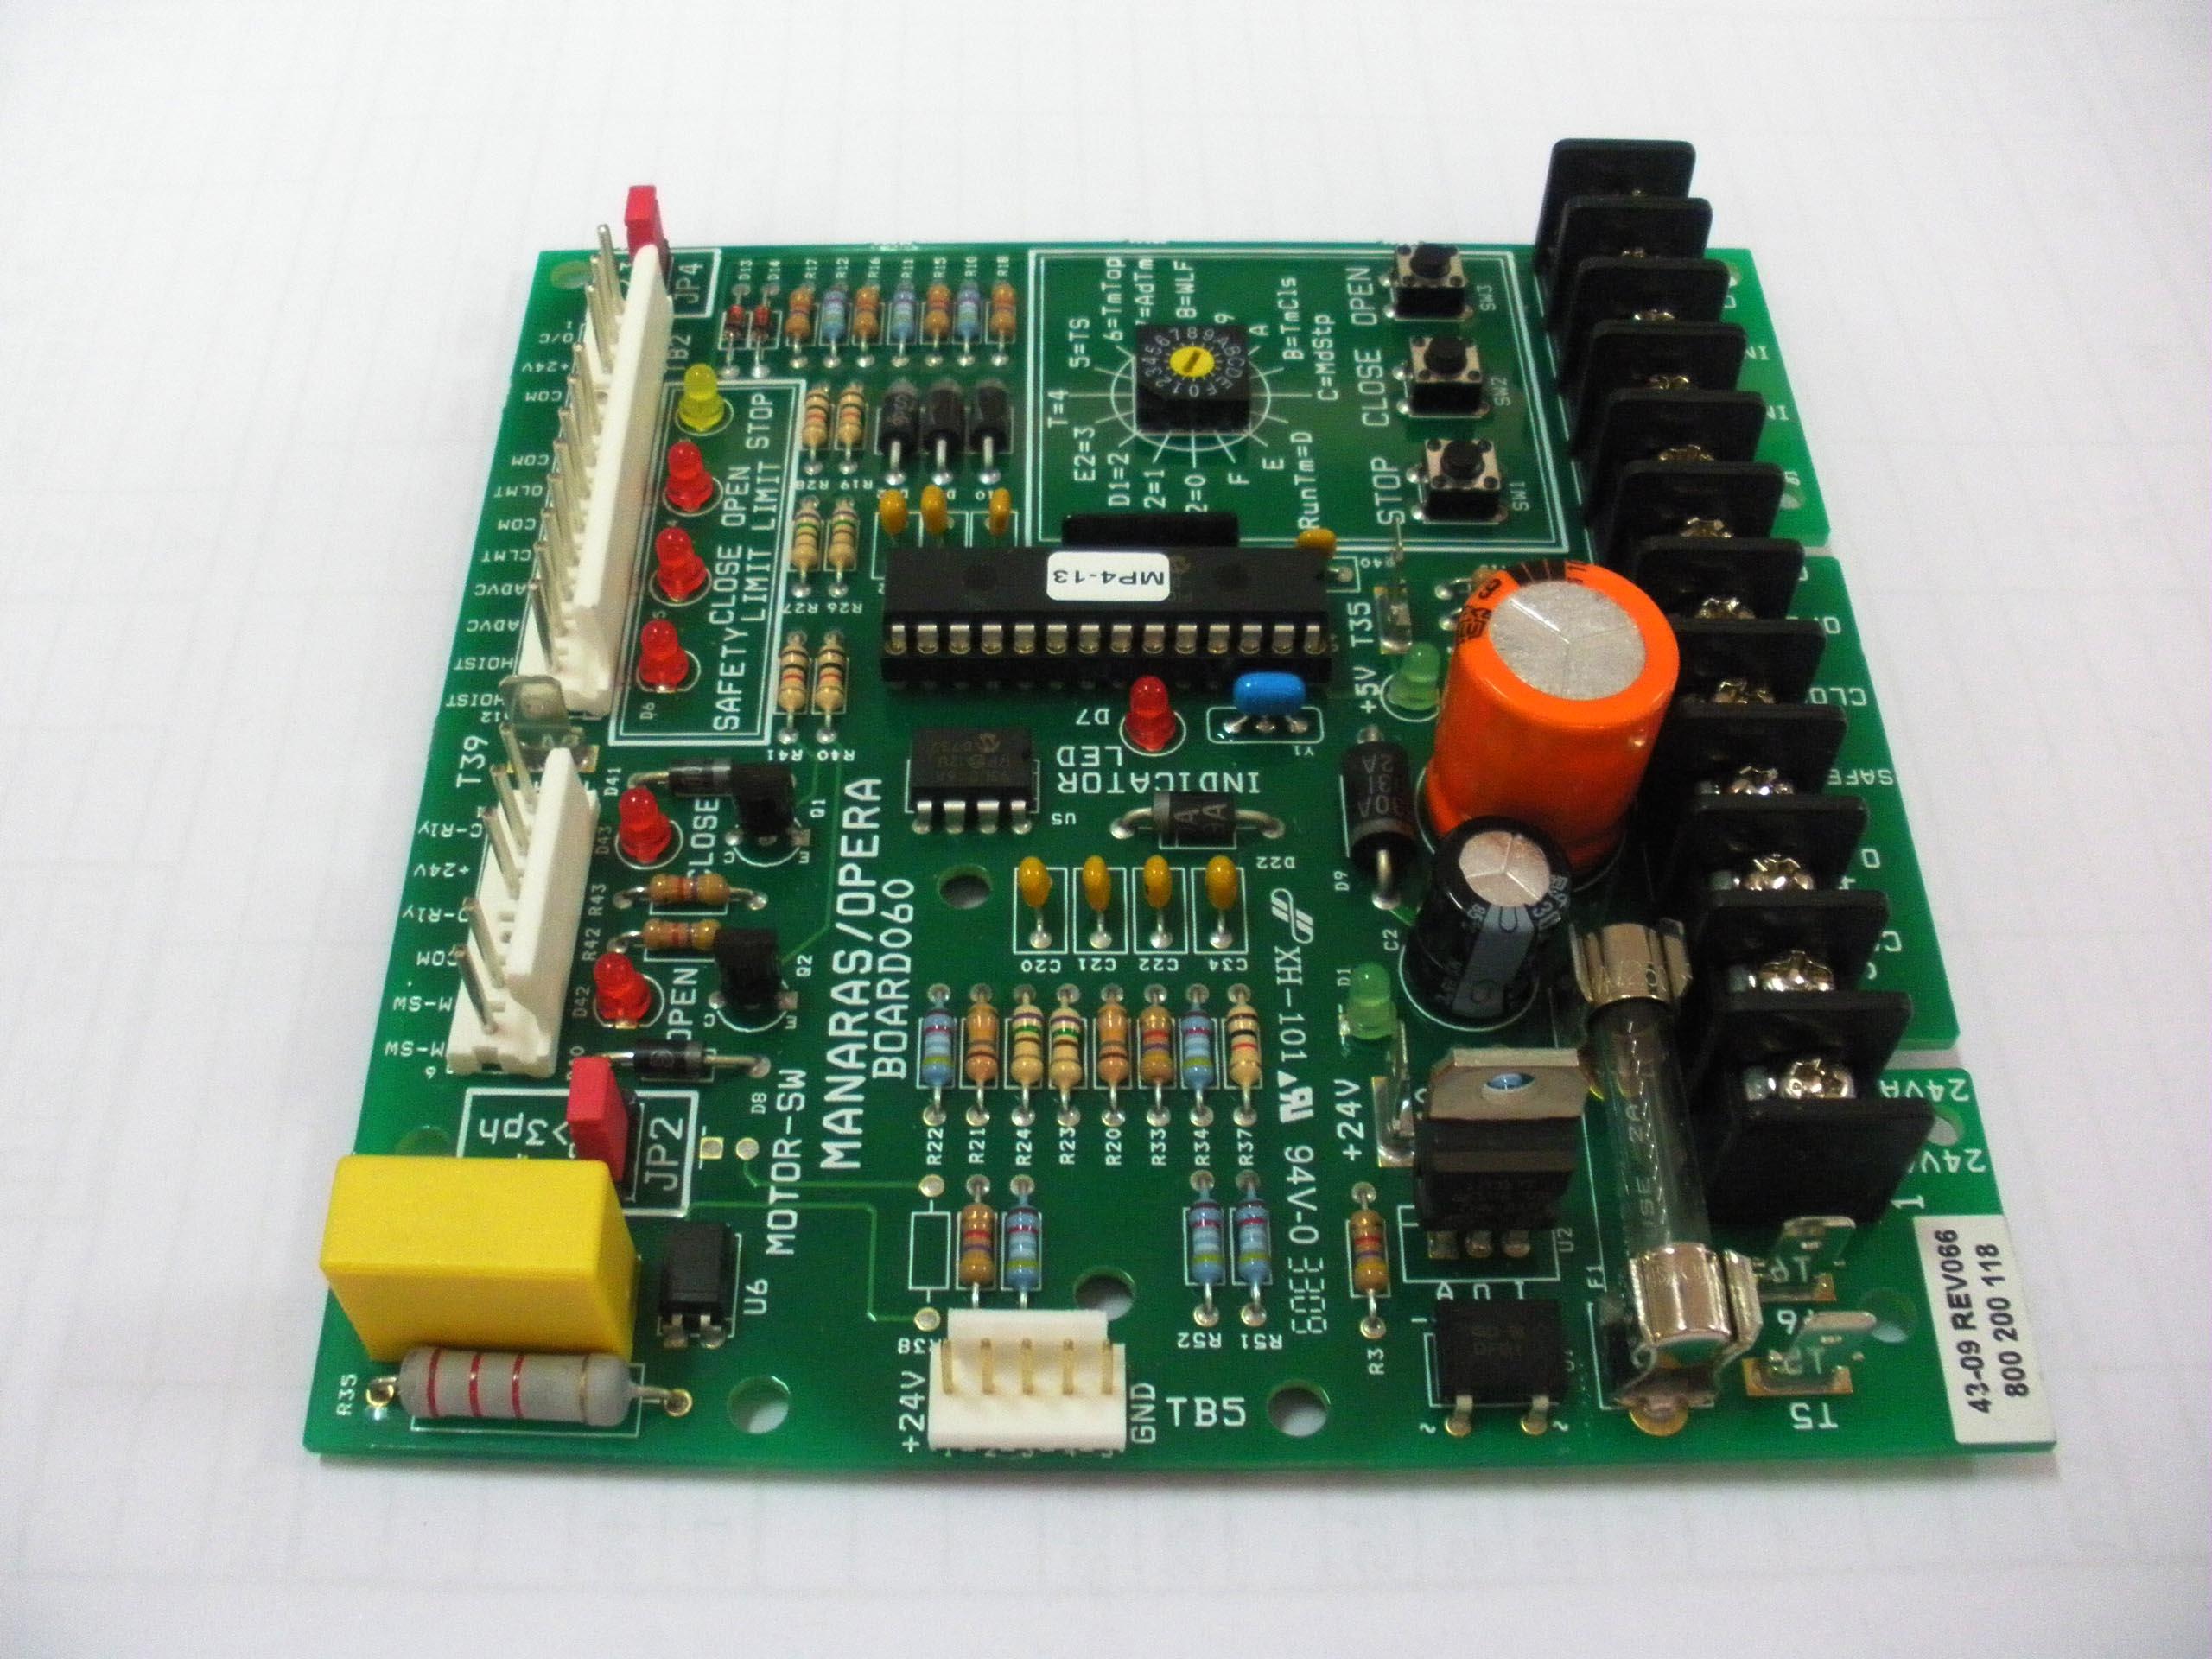 PCBA印刷电路板快速打样加工公司深圳英联杰专业专心